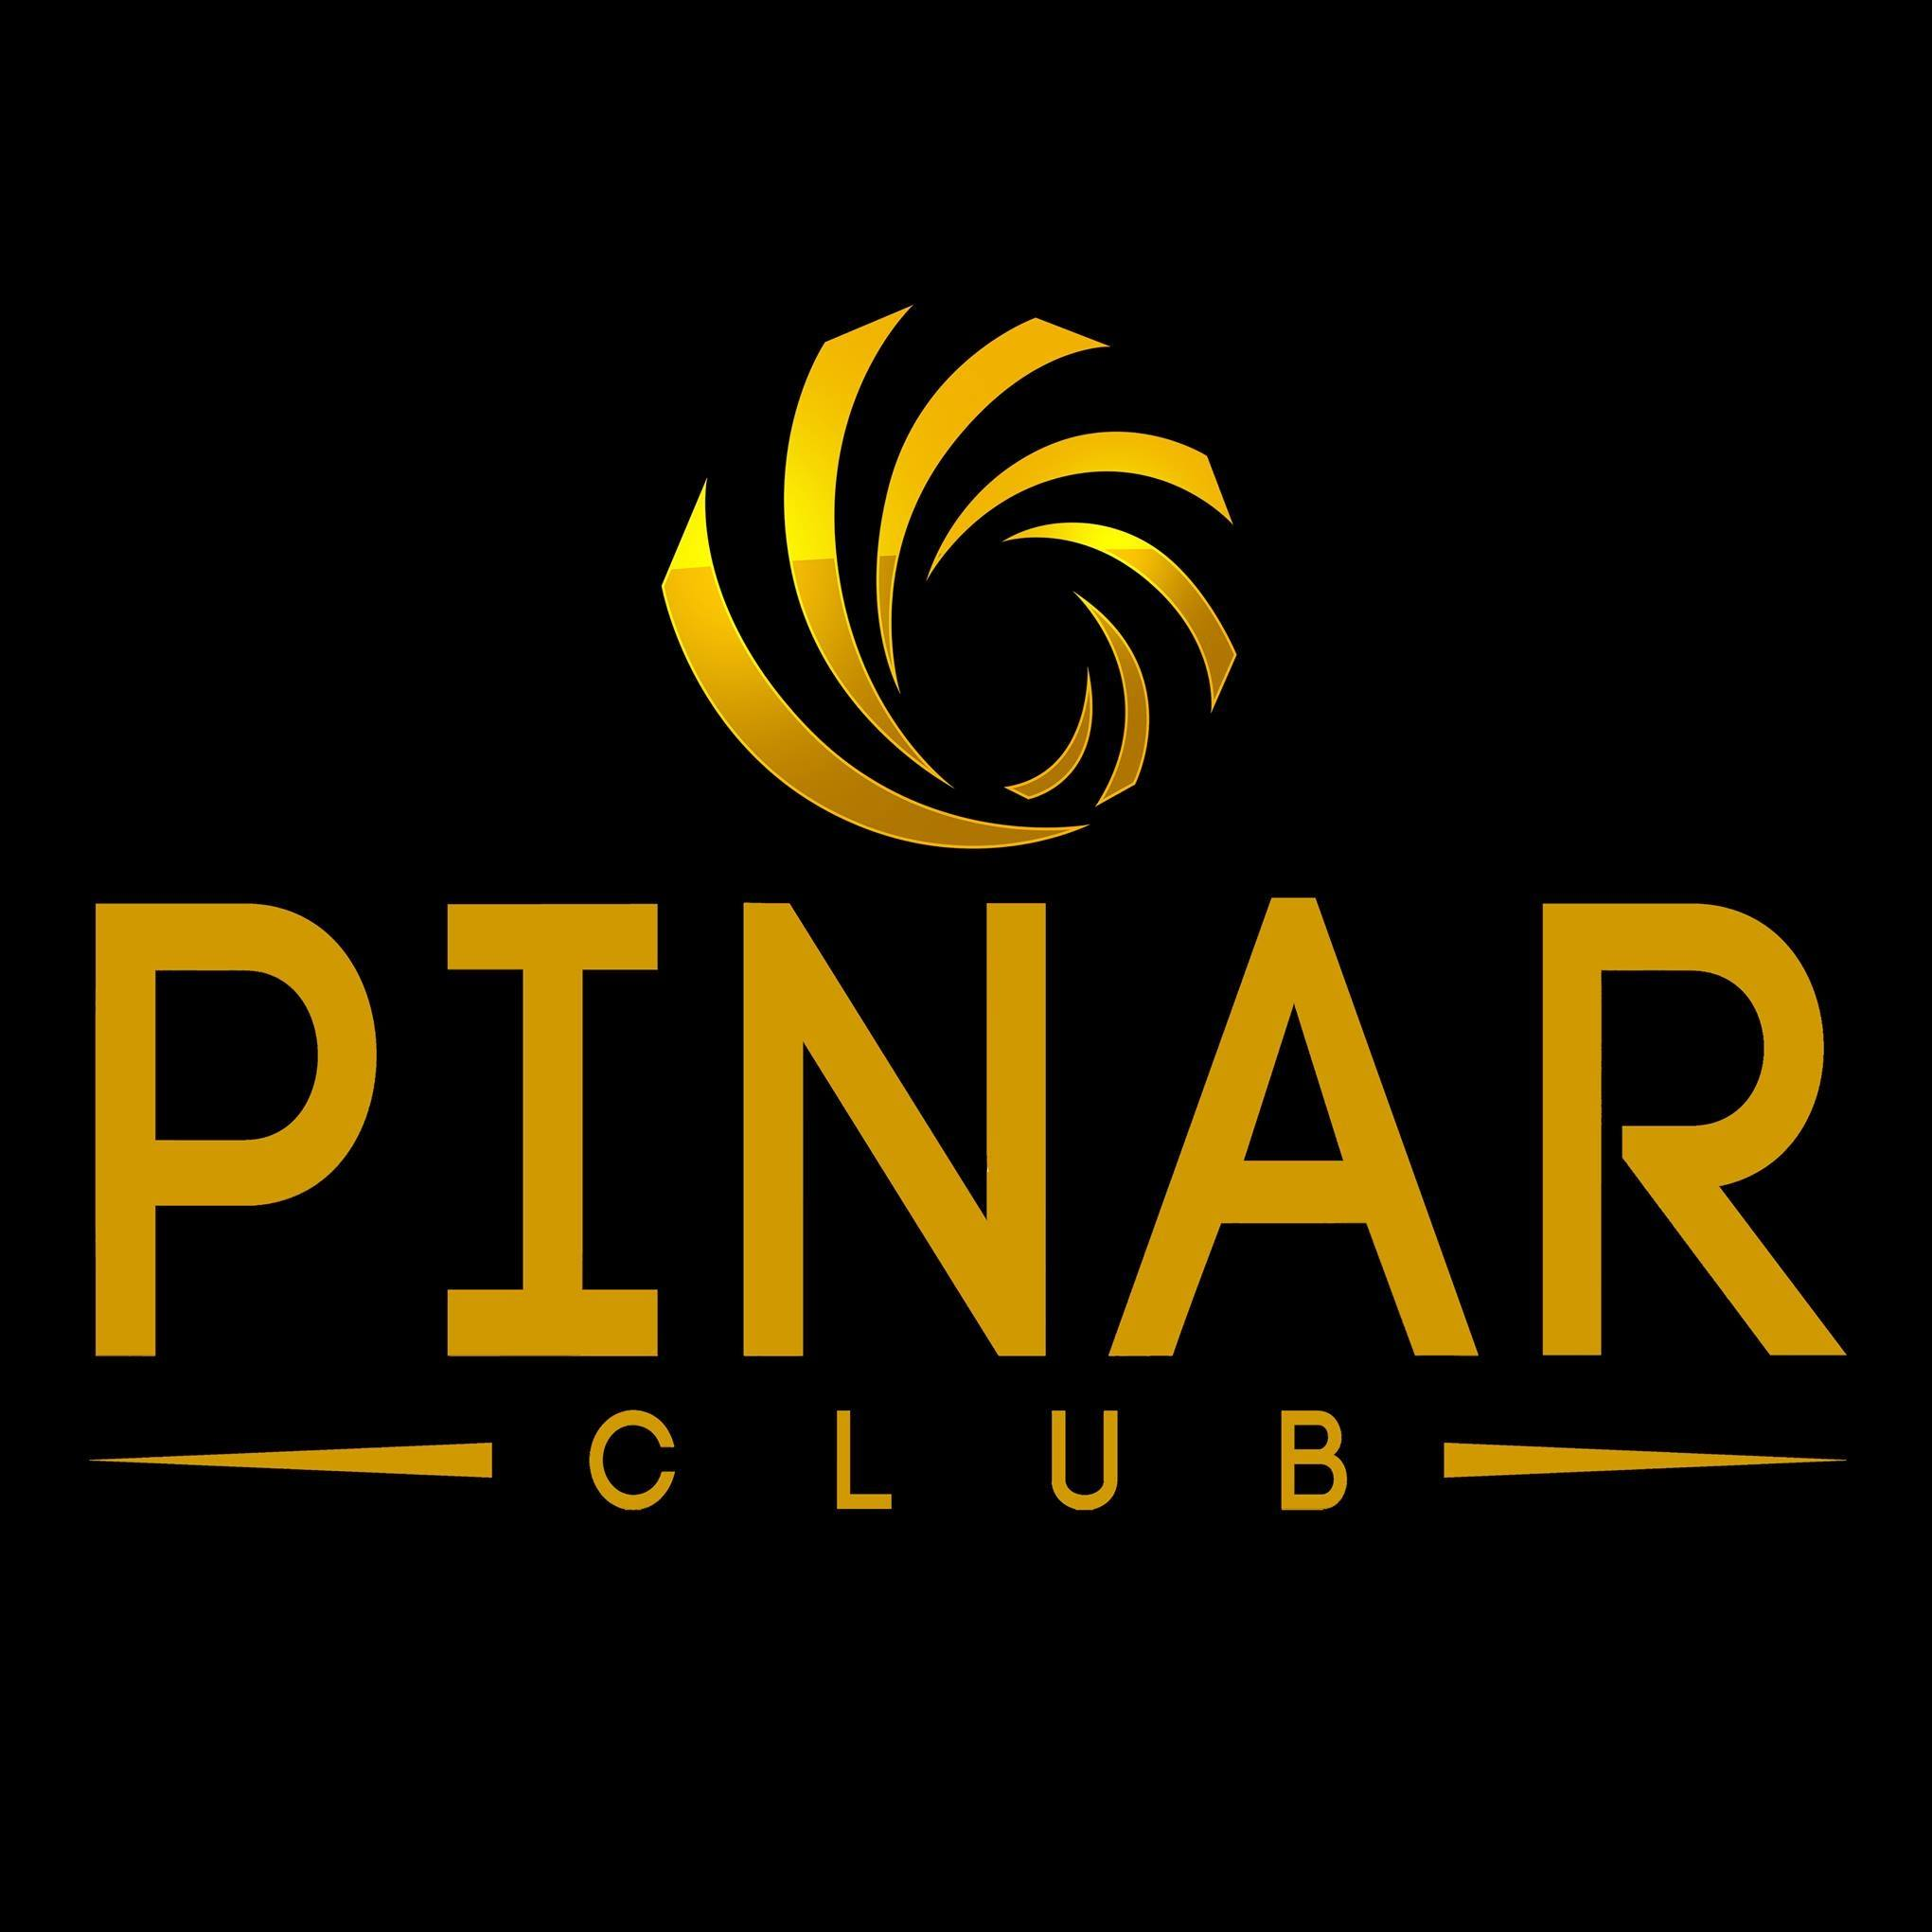 Pinar Club